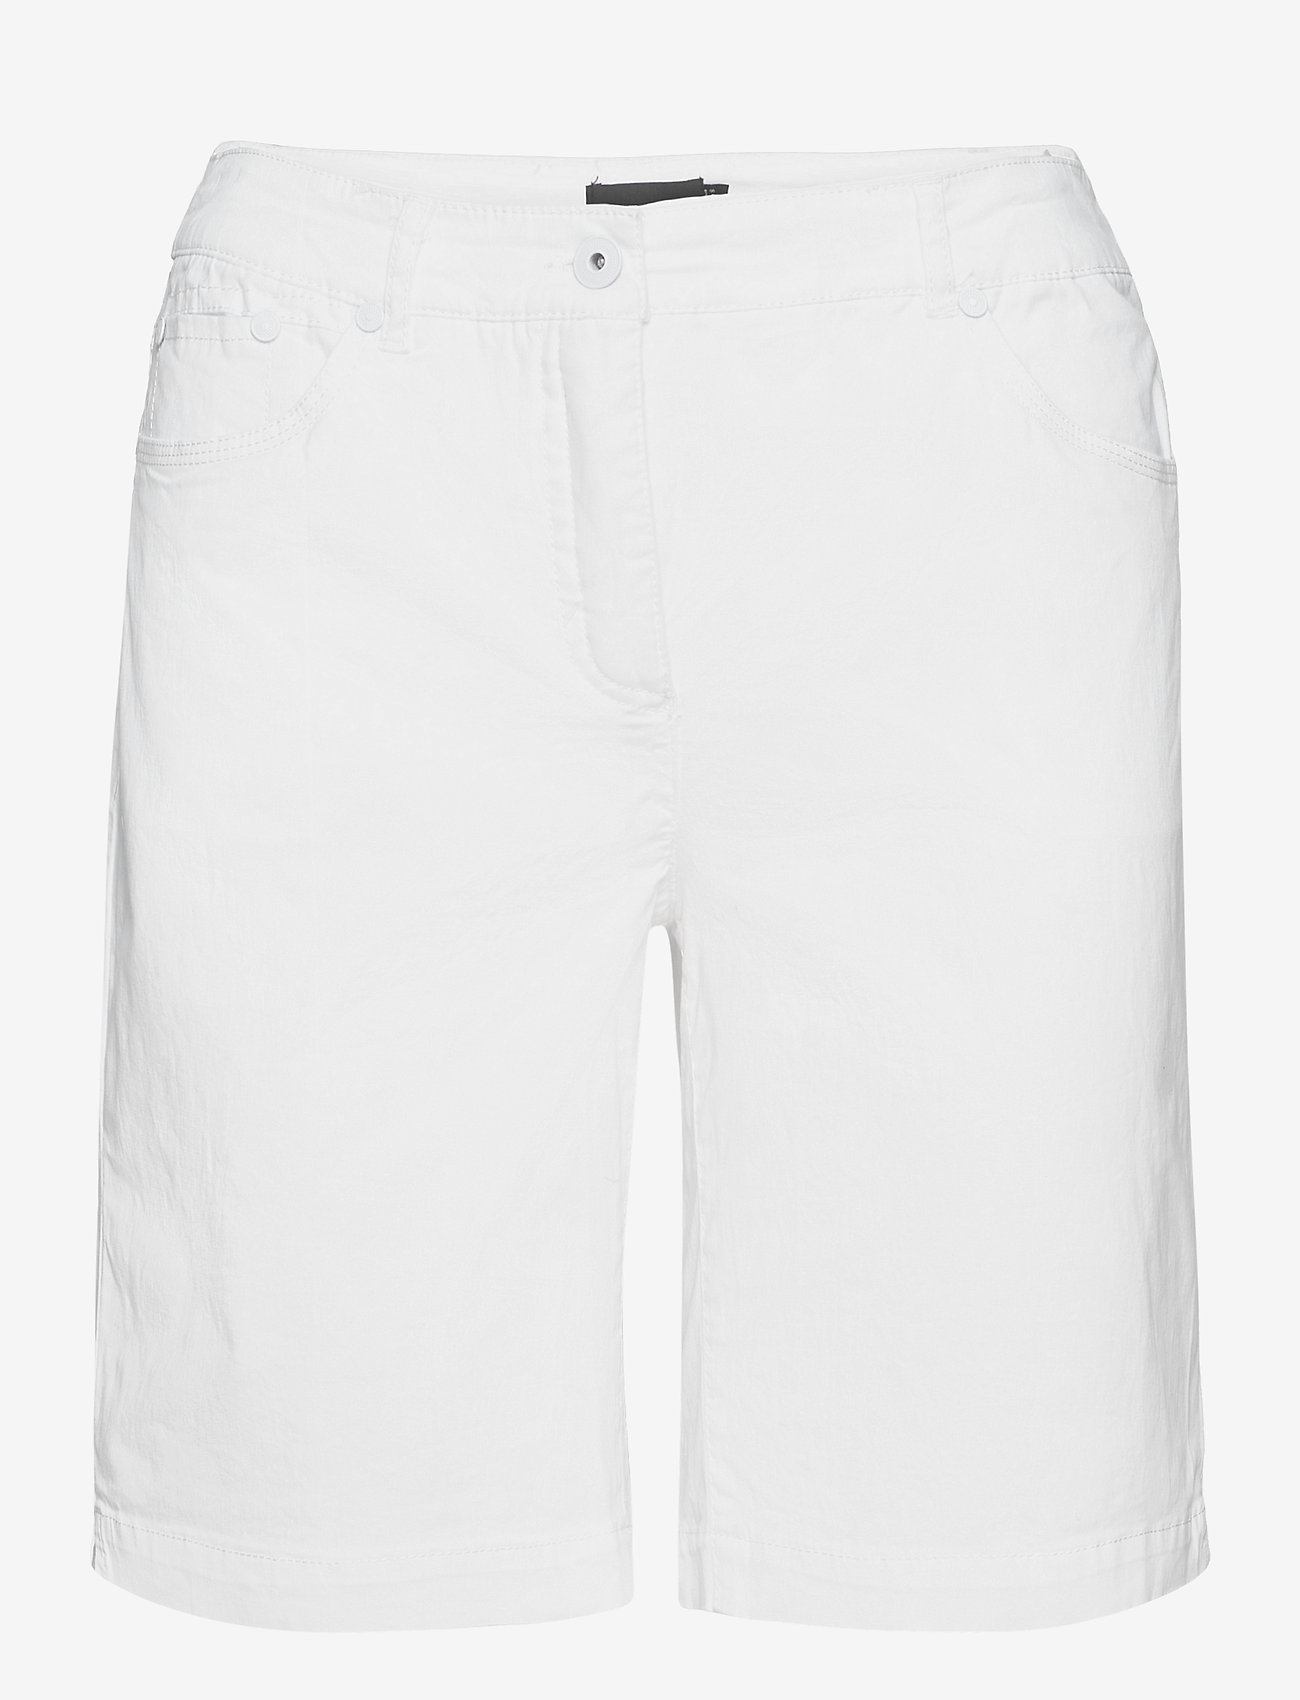 Brandtex - Casual shorts - chino shorts - white - 0